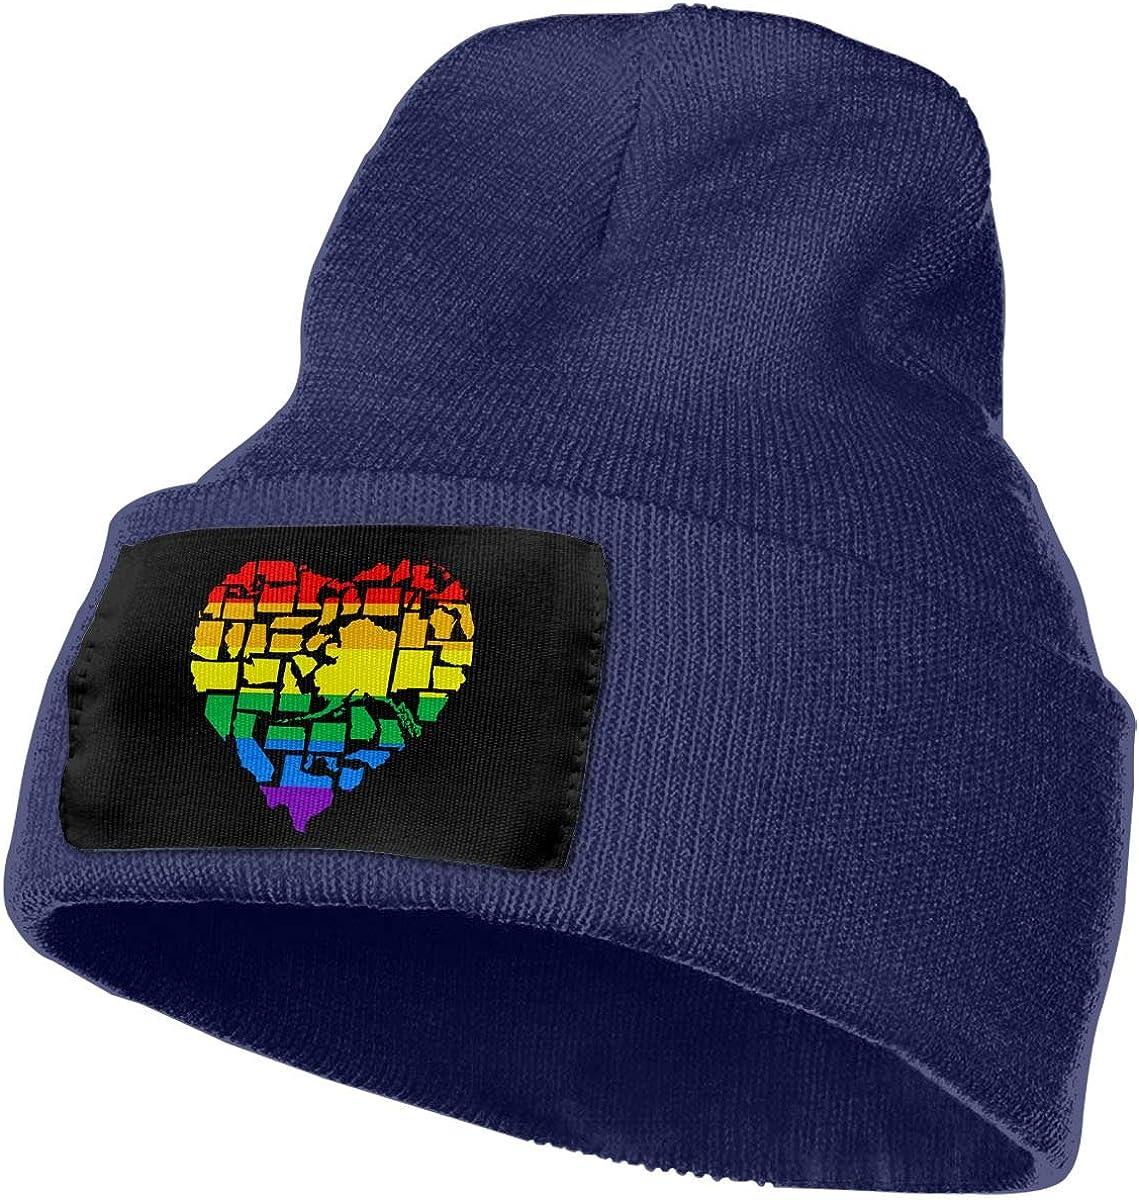 QZqDQ American LGBT Heart Unisex Fashion Knitted Hat Luxury Hip-Hop Cap